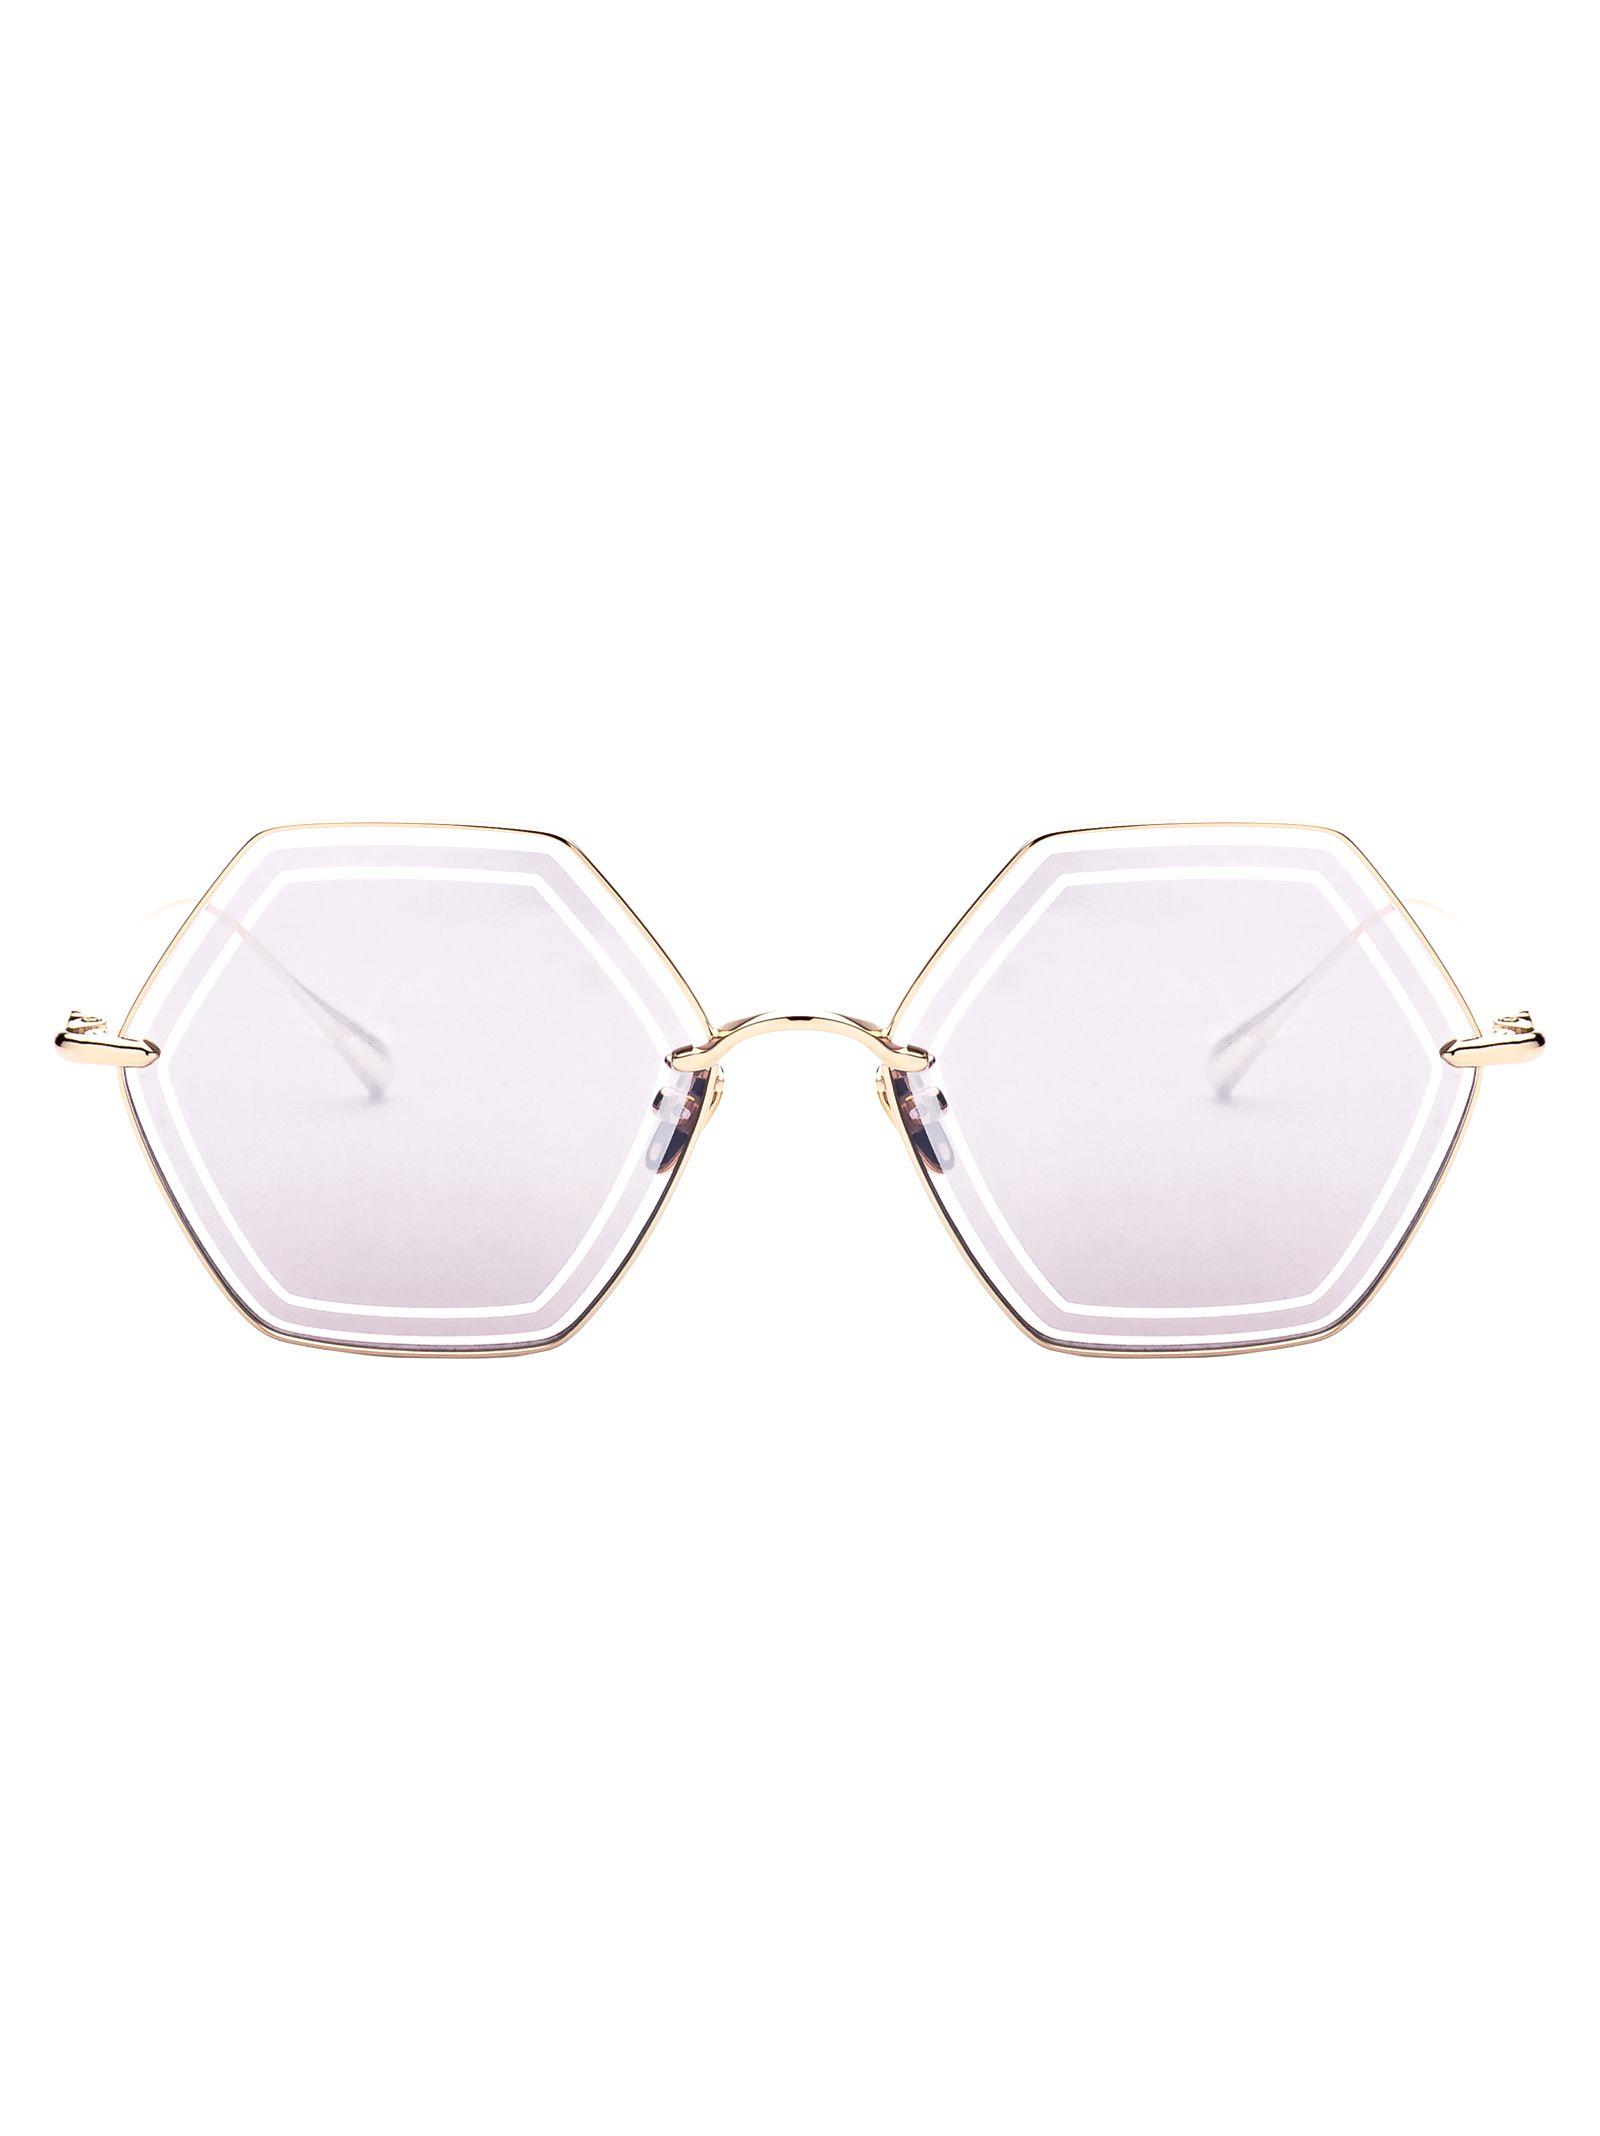 FRENCY & MERCURY California Signal Glasses in Slgsp